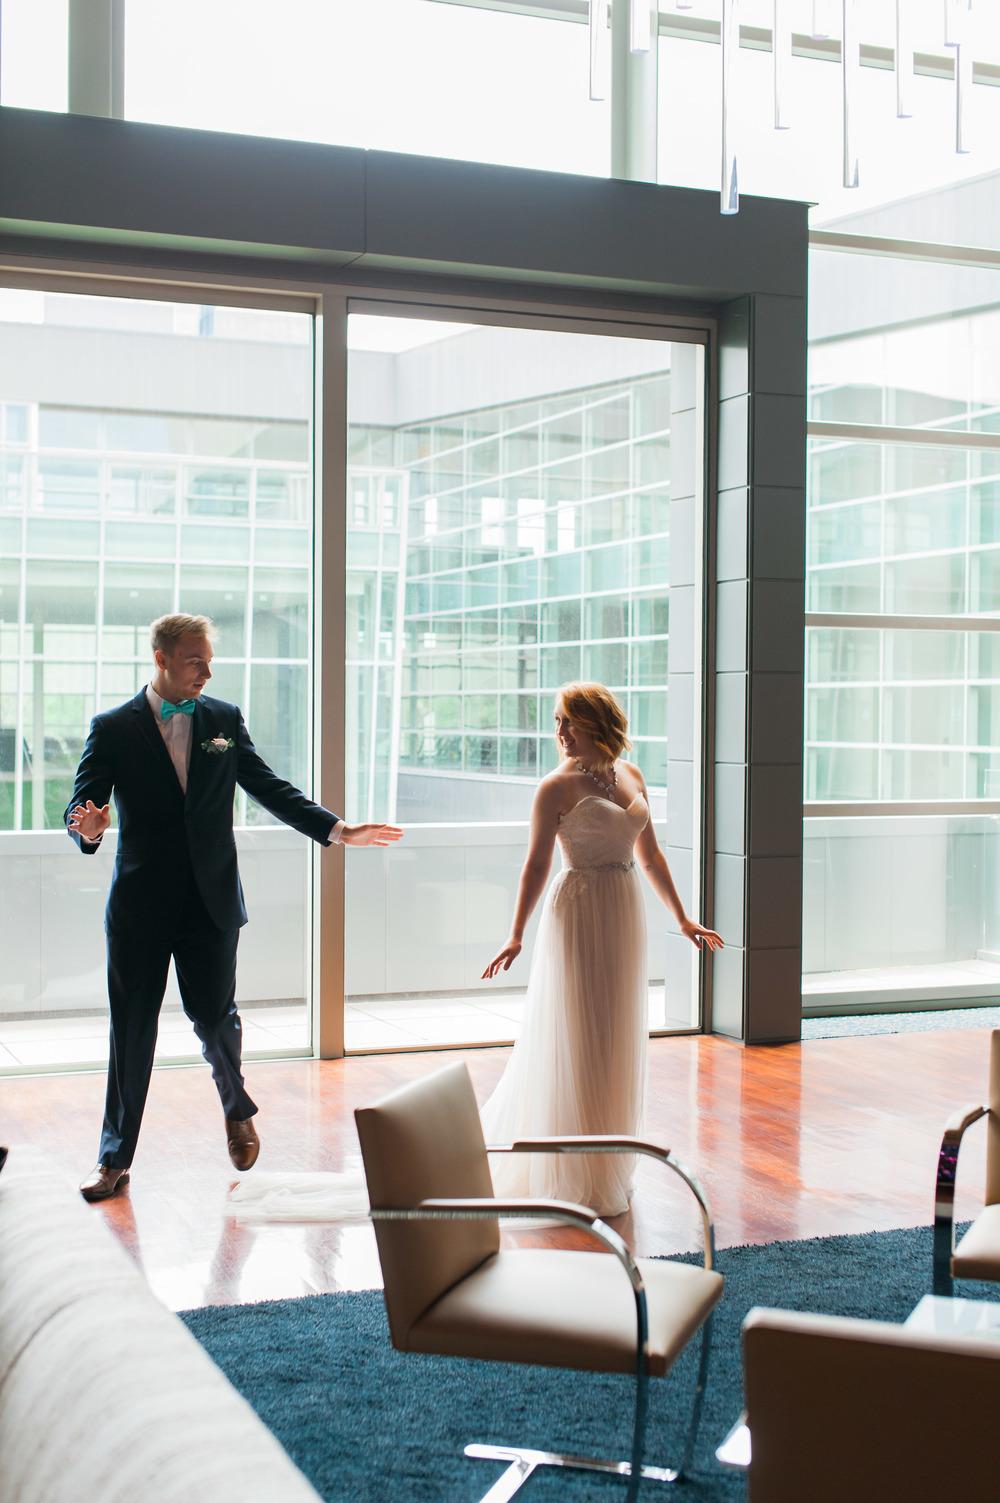 omaha-holland-arts-center-wedding-31.jpg